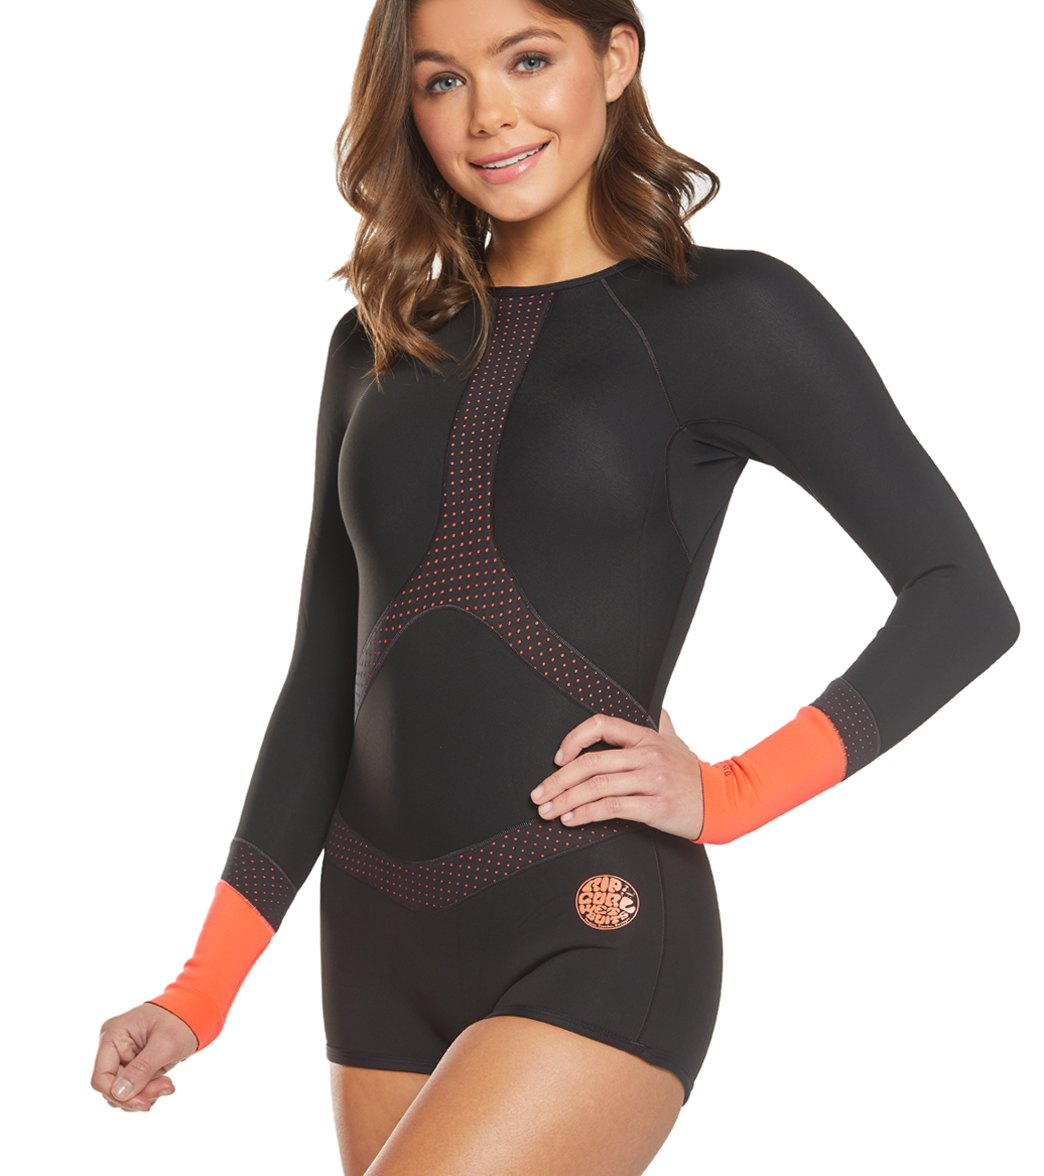 Rip Curl Women s 1mm G-Bomb Madison Long Sleeve Boyleg Spring Suit Wetsuit 11da151000